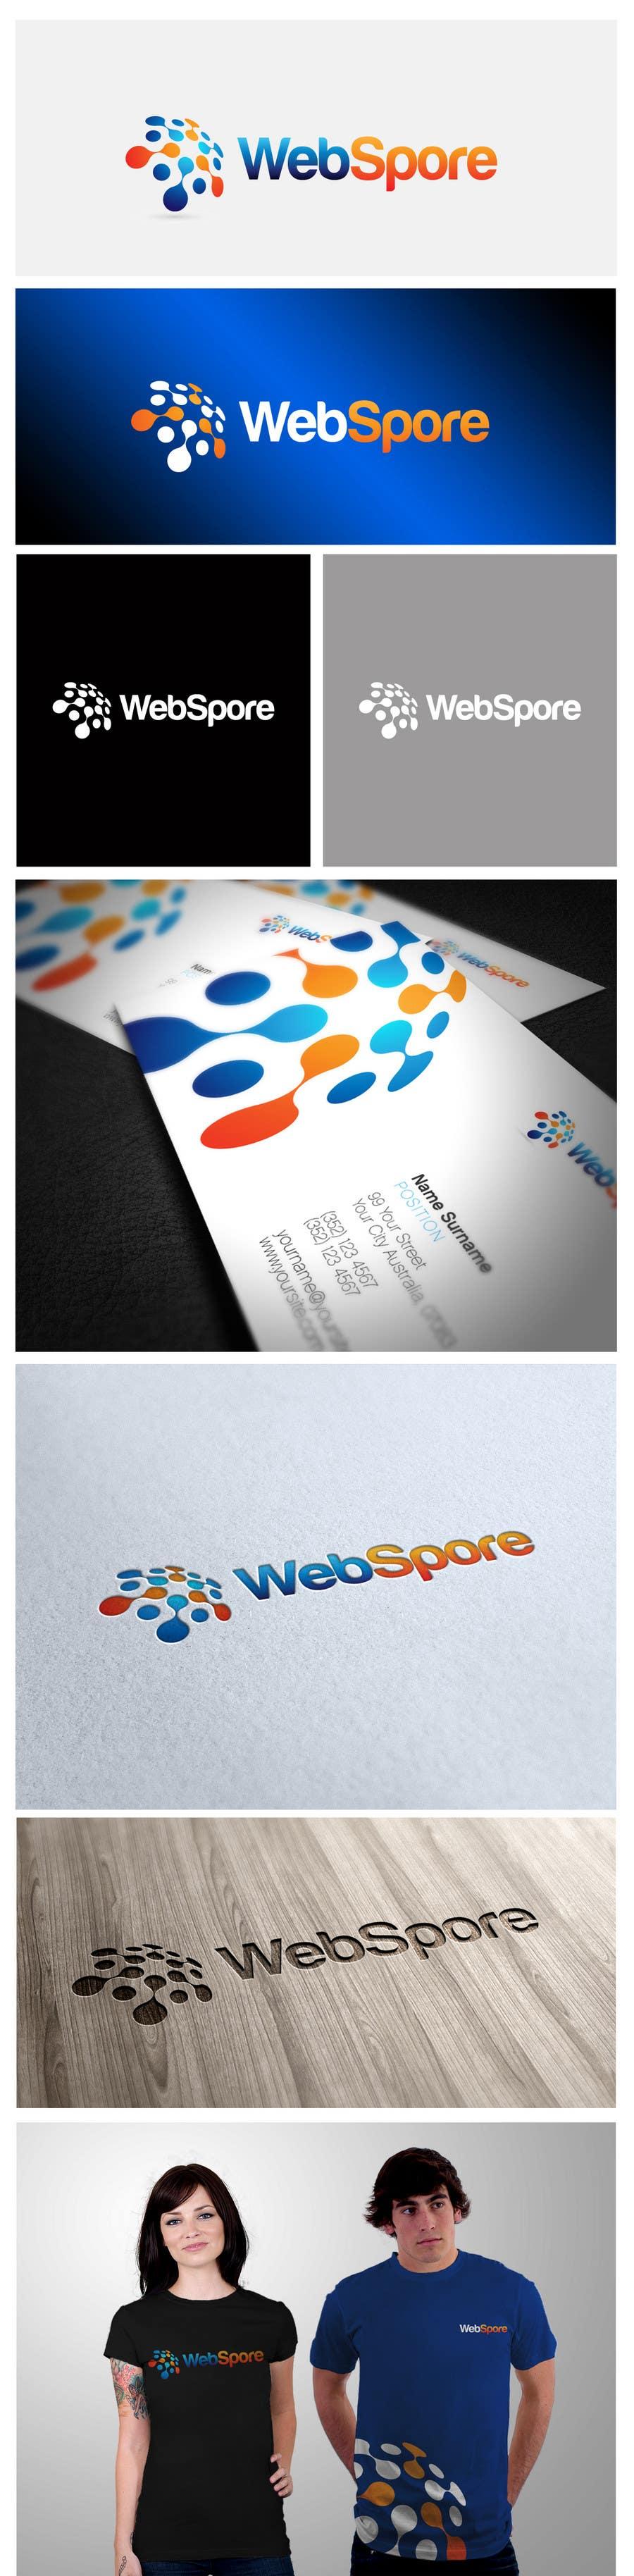 Proposition n°67 du concours Logo Design for WebSpore LLC